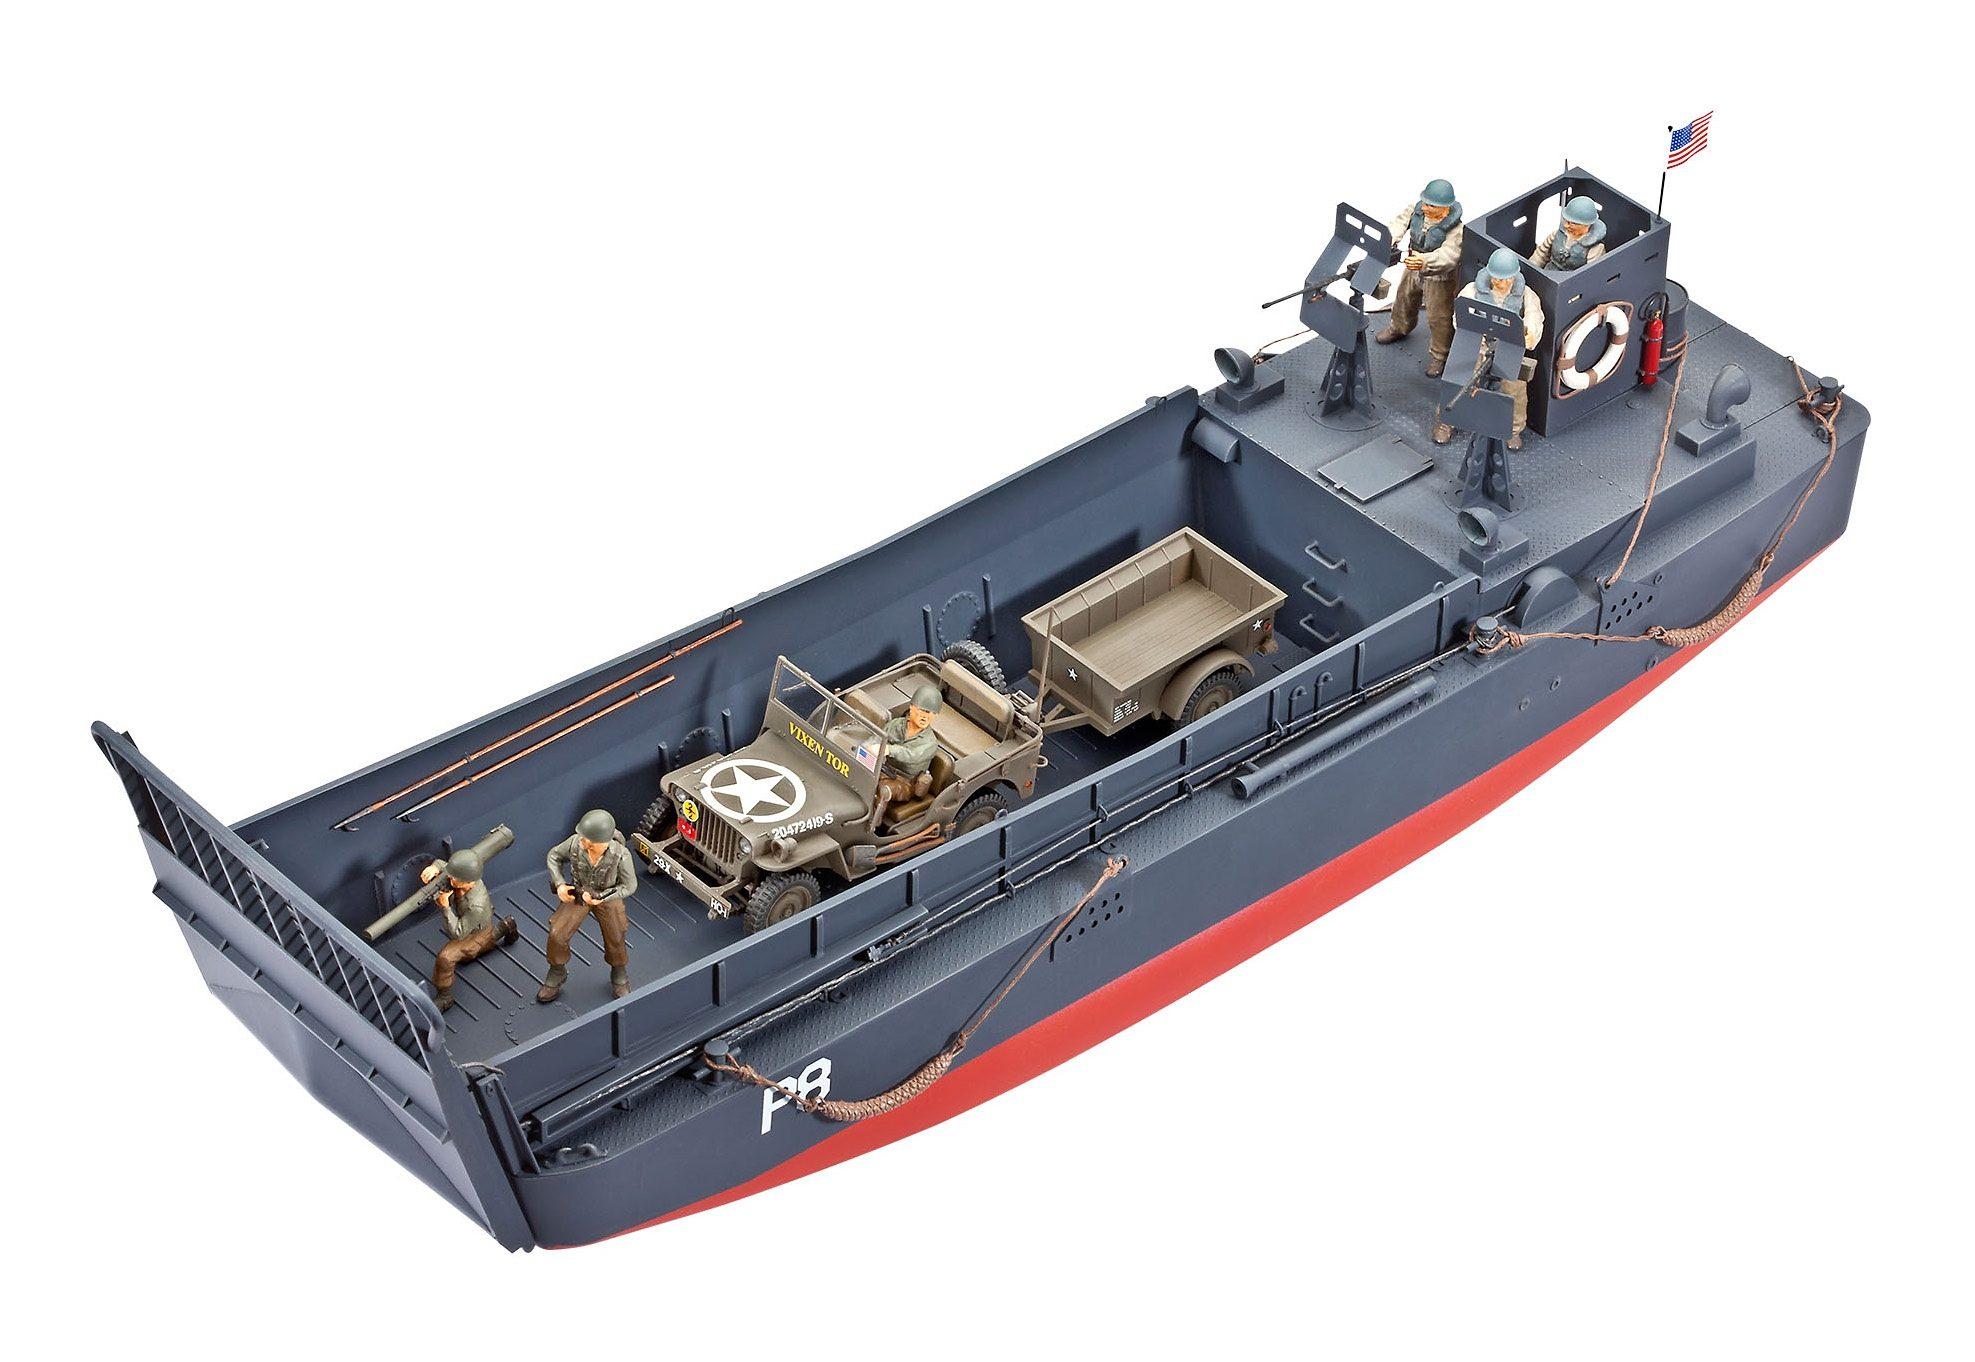 Revell® Modellbausatz Boot mit Fahrzeug, »D-Day Set LCM3 & 4x4 Off-Road Vehicle«, Maßstab 1:35